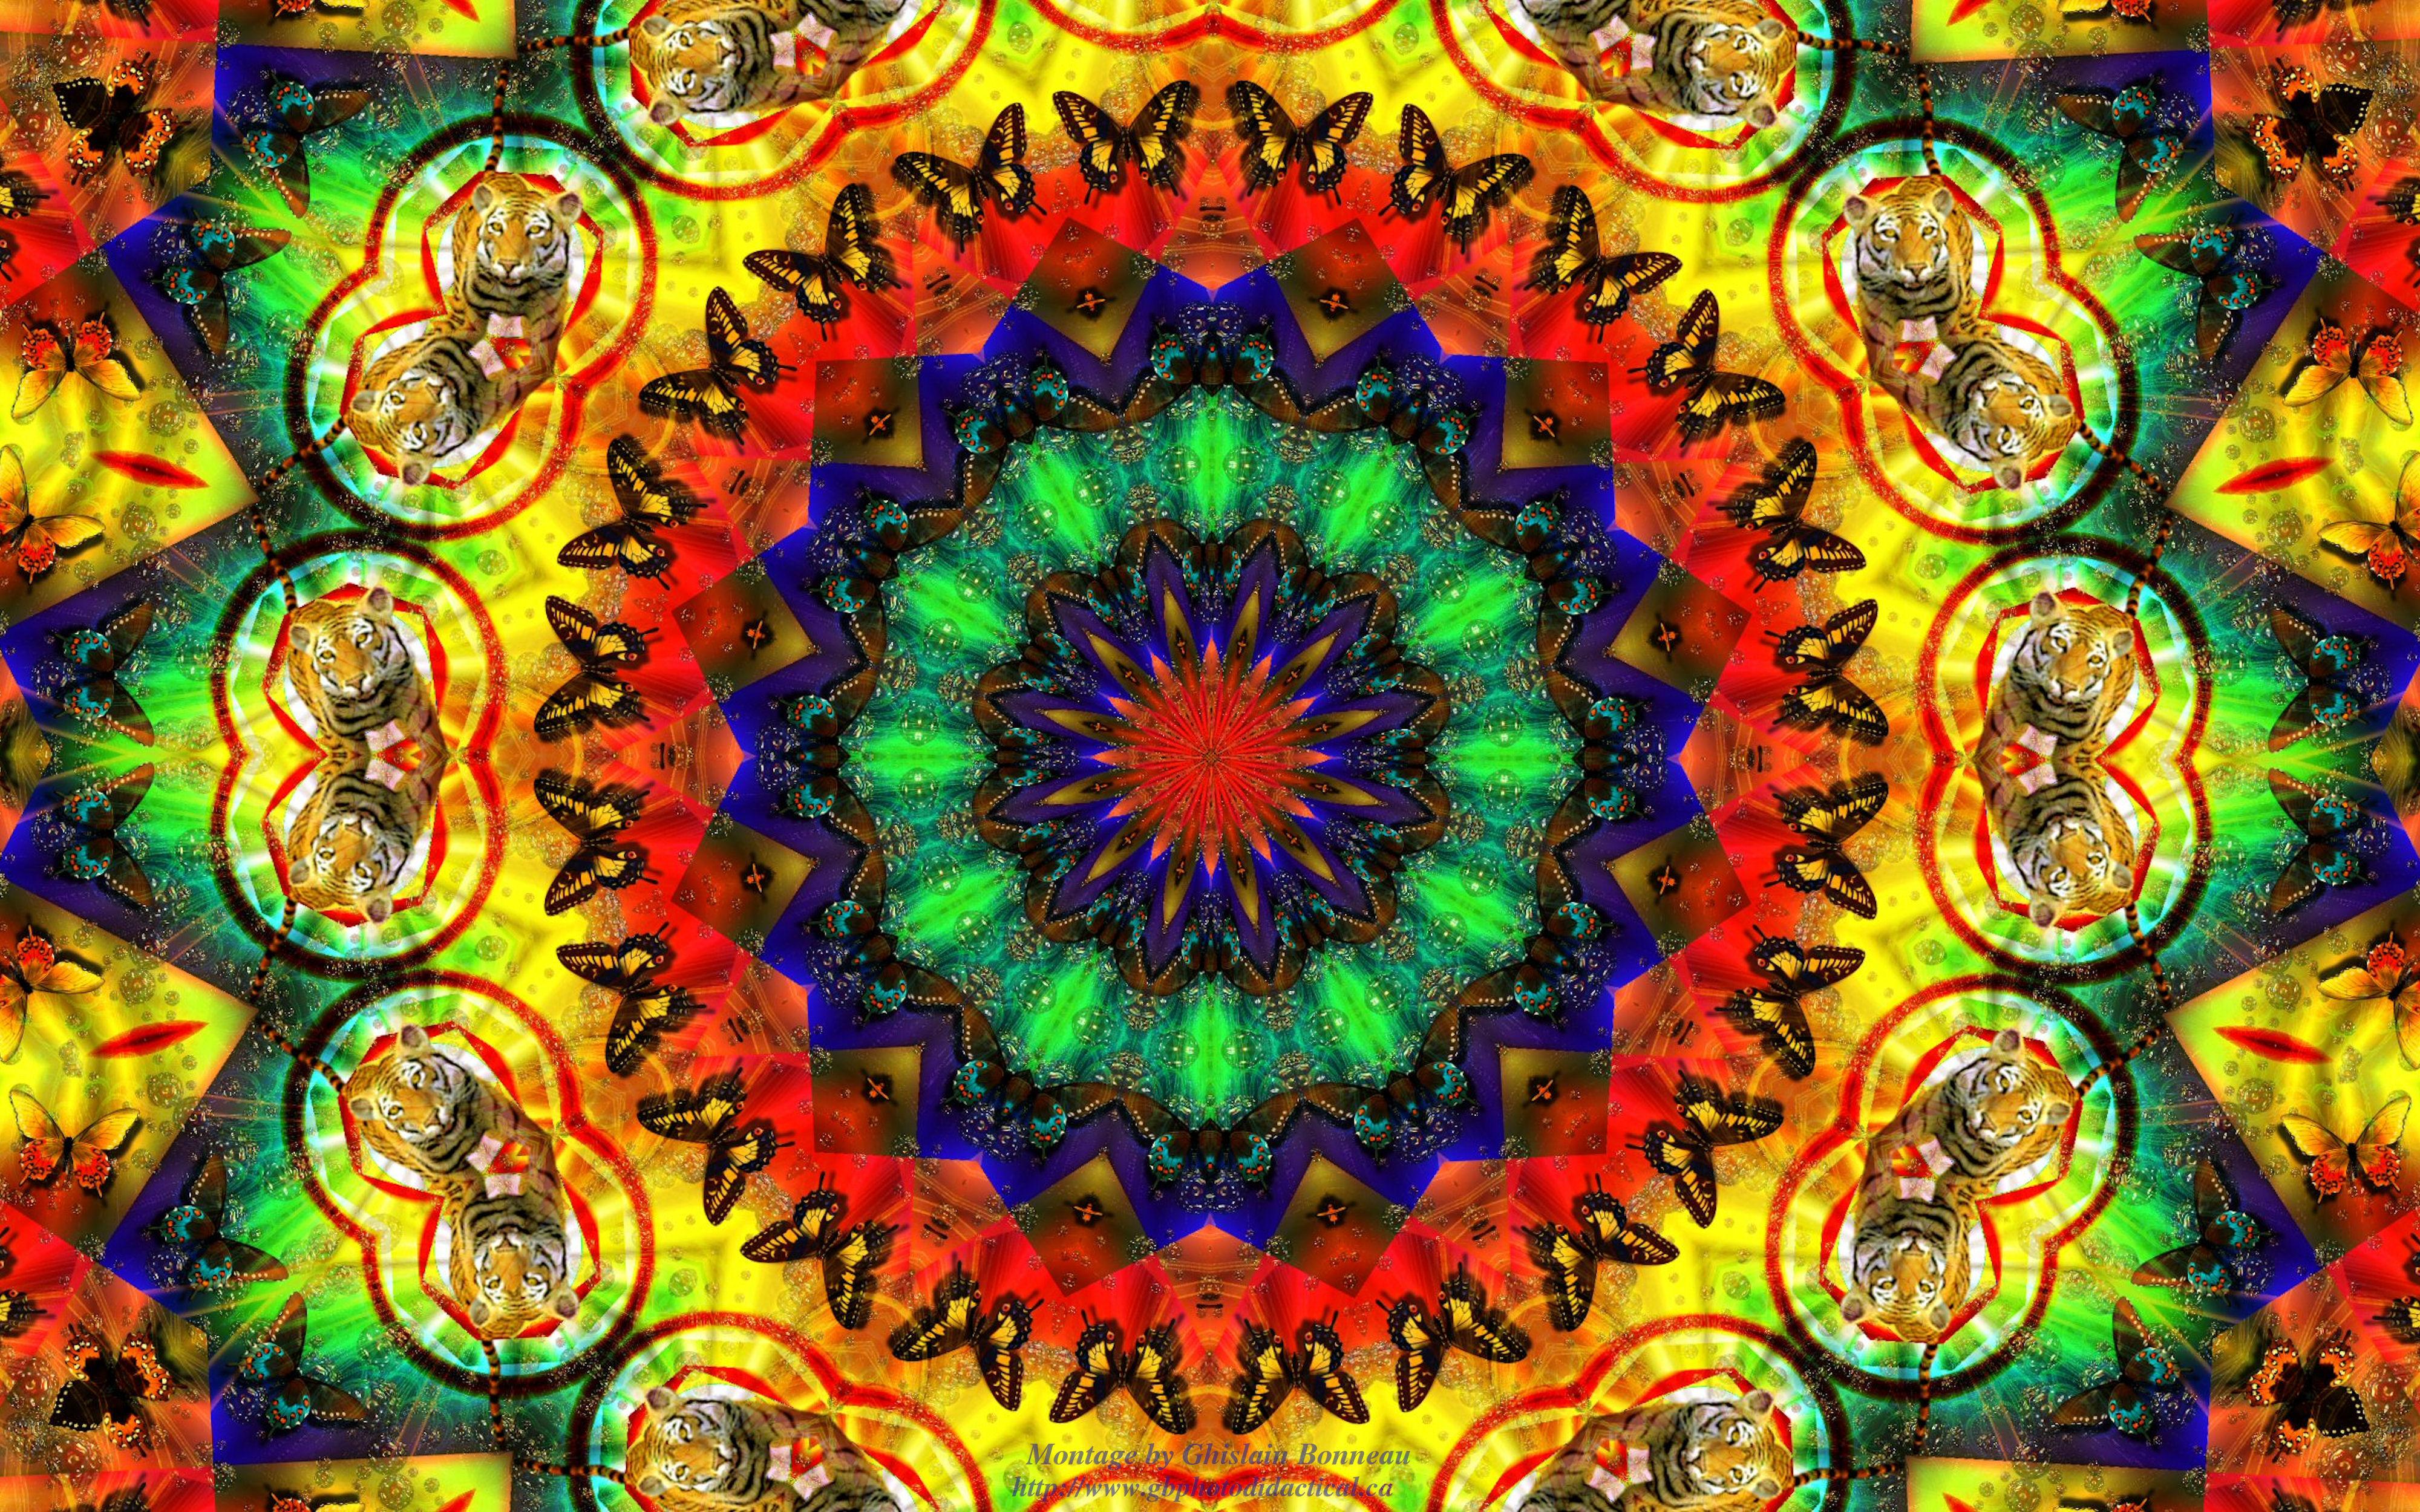 Keleidoscope 4k ultra hd wallpaper and background image 4000x2500 abstract kaleidoscope keleidoscope wallpaper voltagebd Choice Image